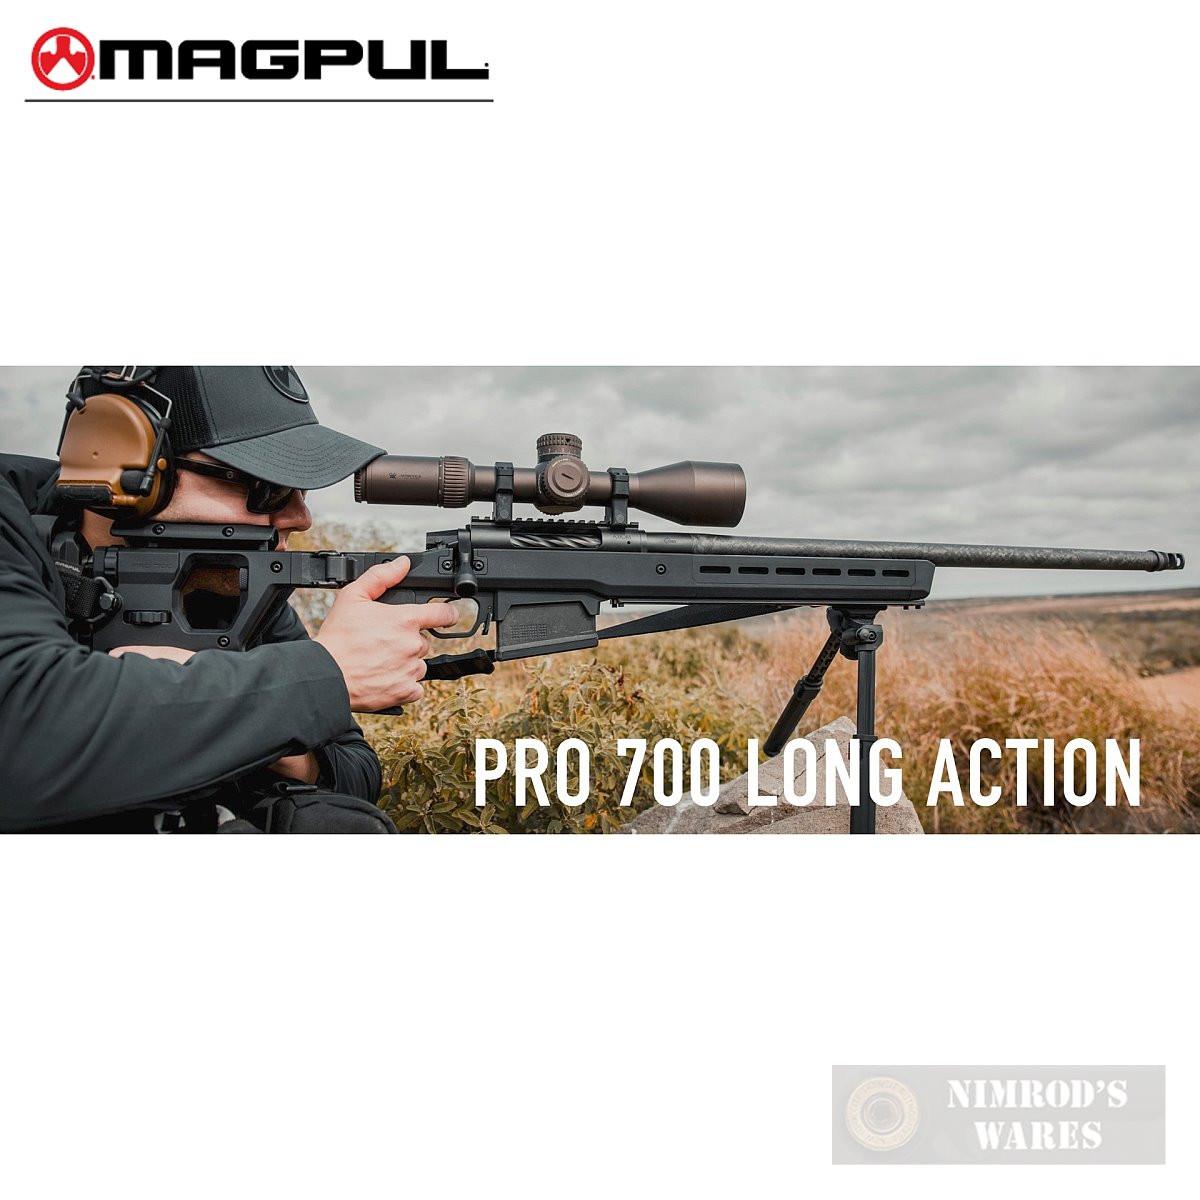 MAGPUL Pro 700L Remington 700 LA Stock Chassis FOLDING MAG1002-BLK